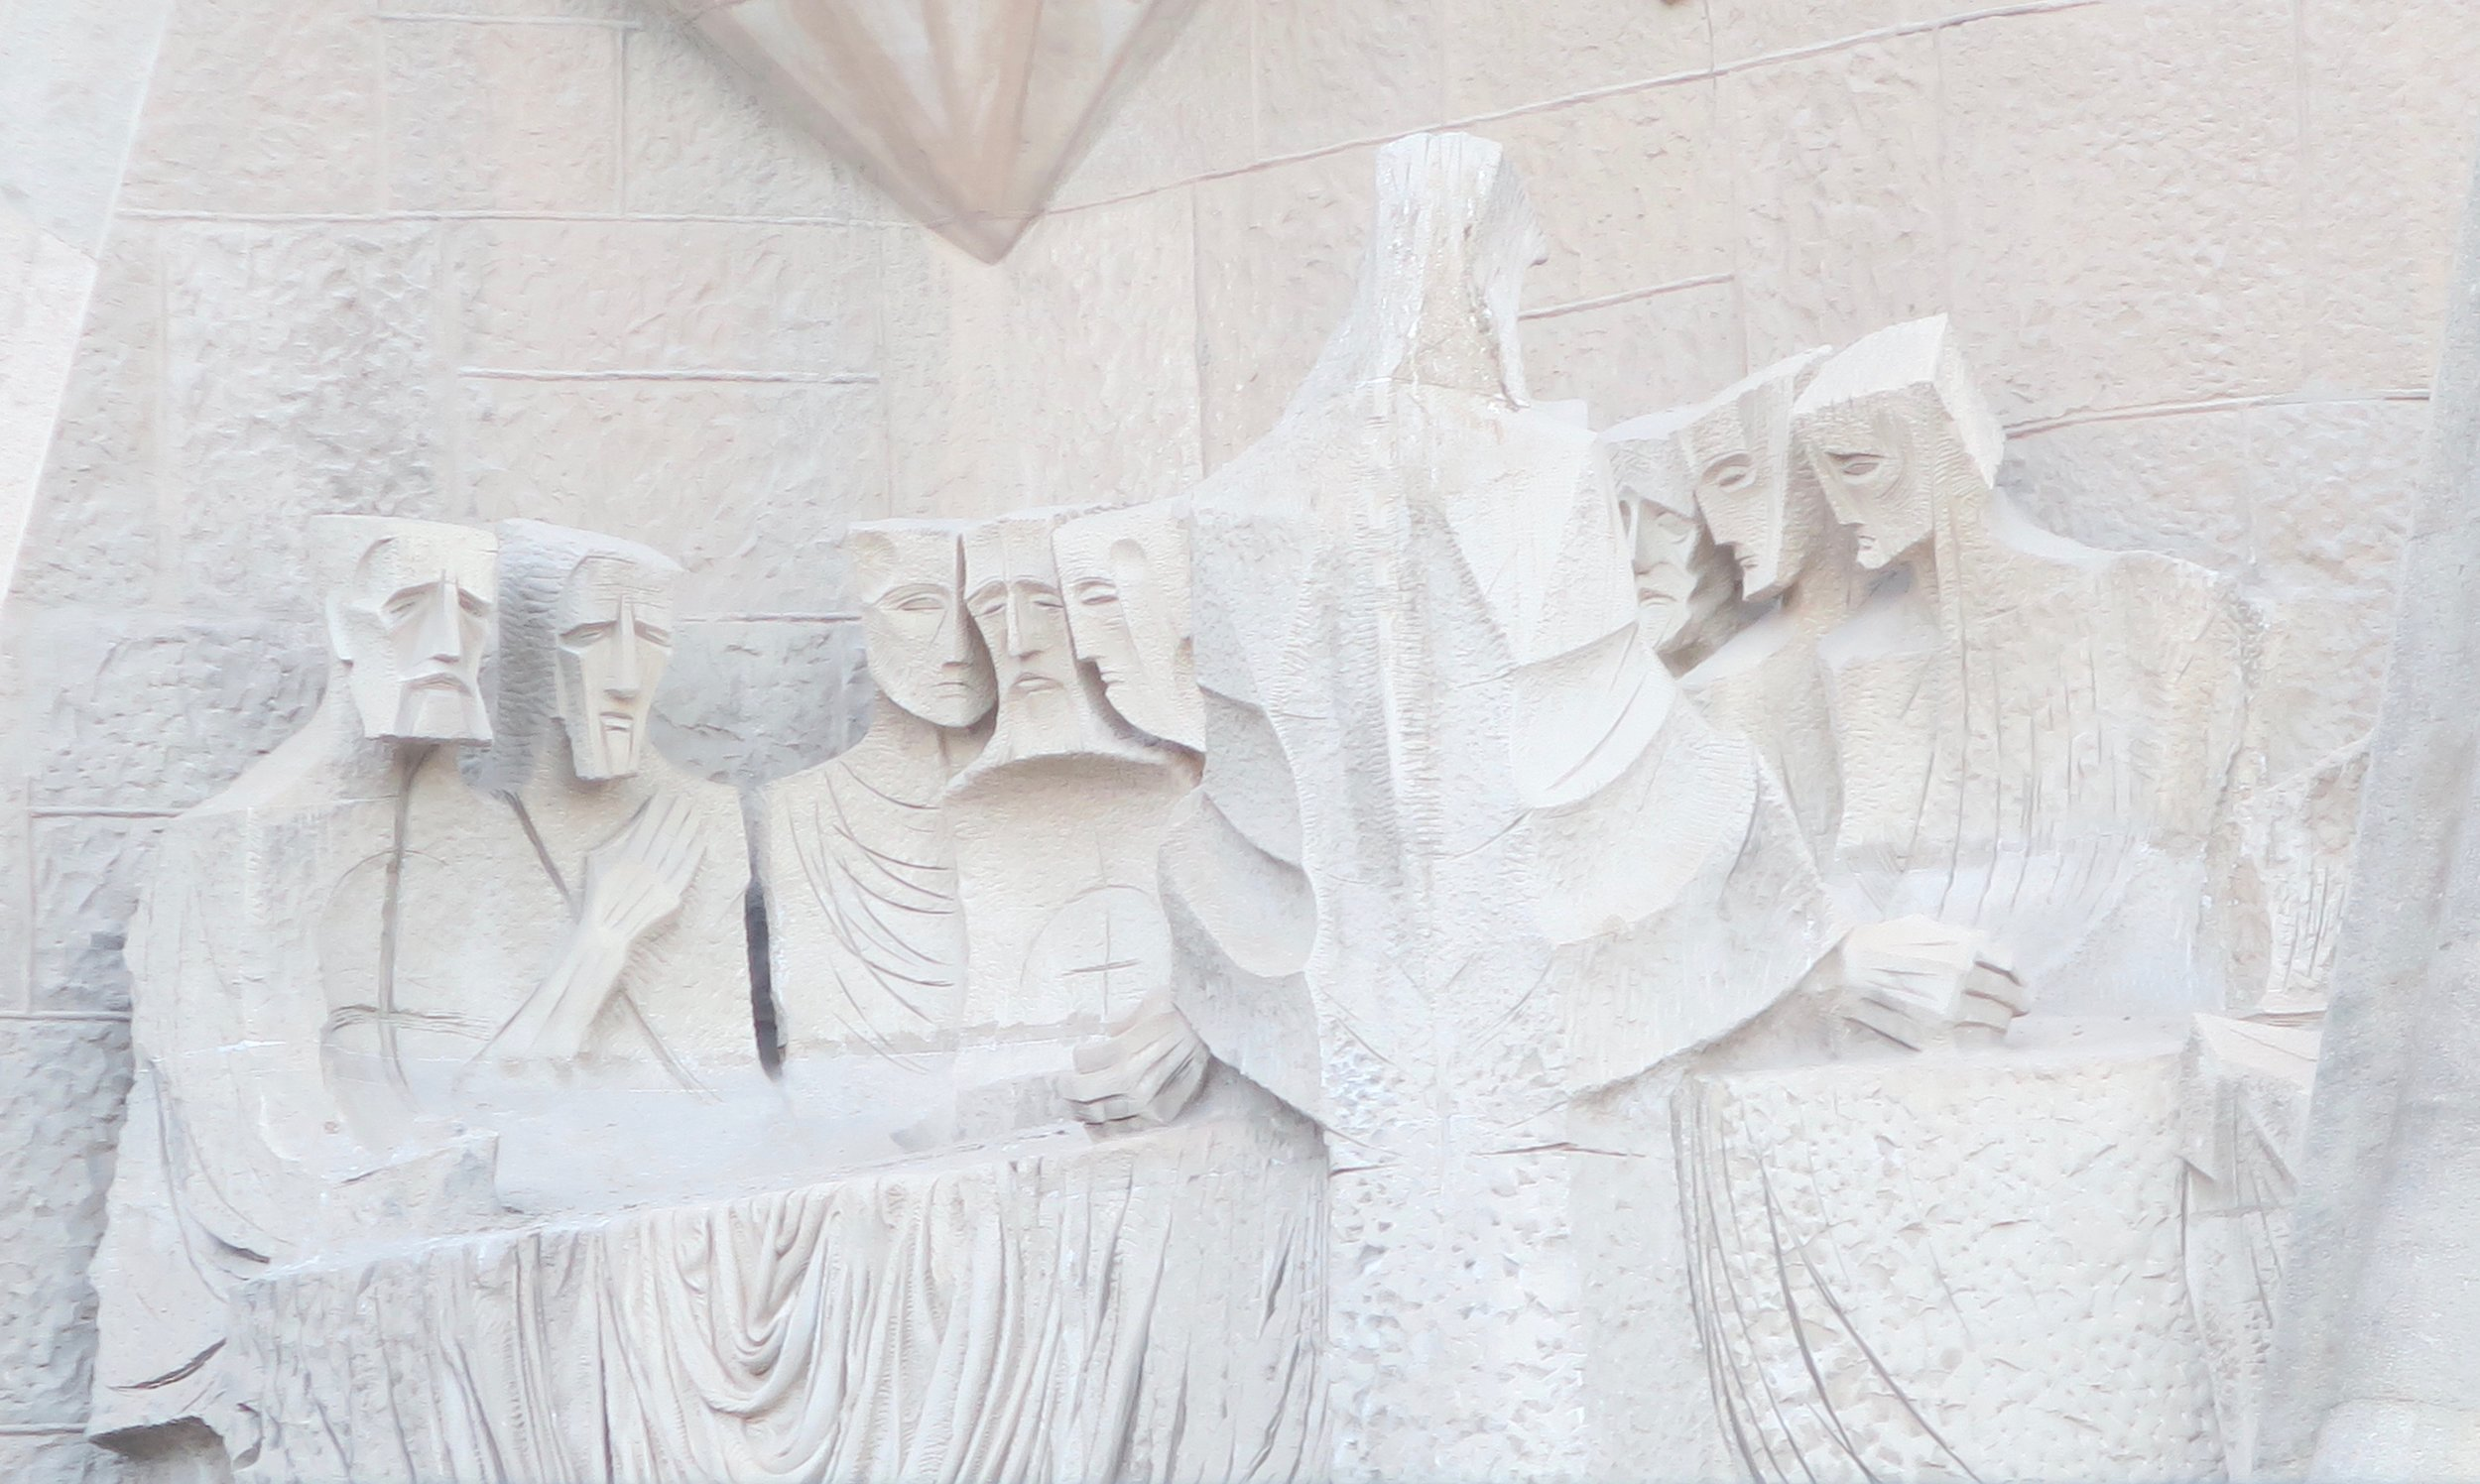 from Sagrada Familia, Barcelona